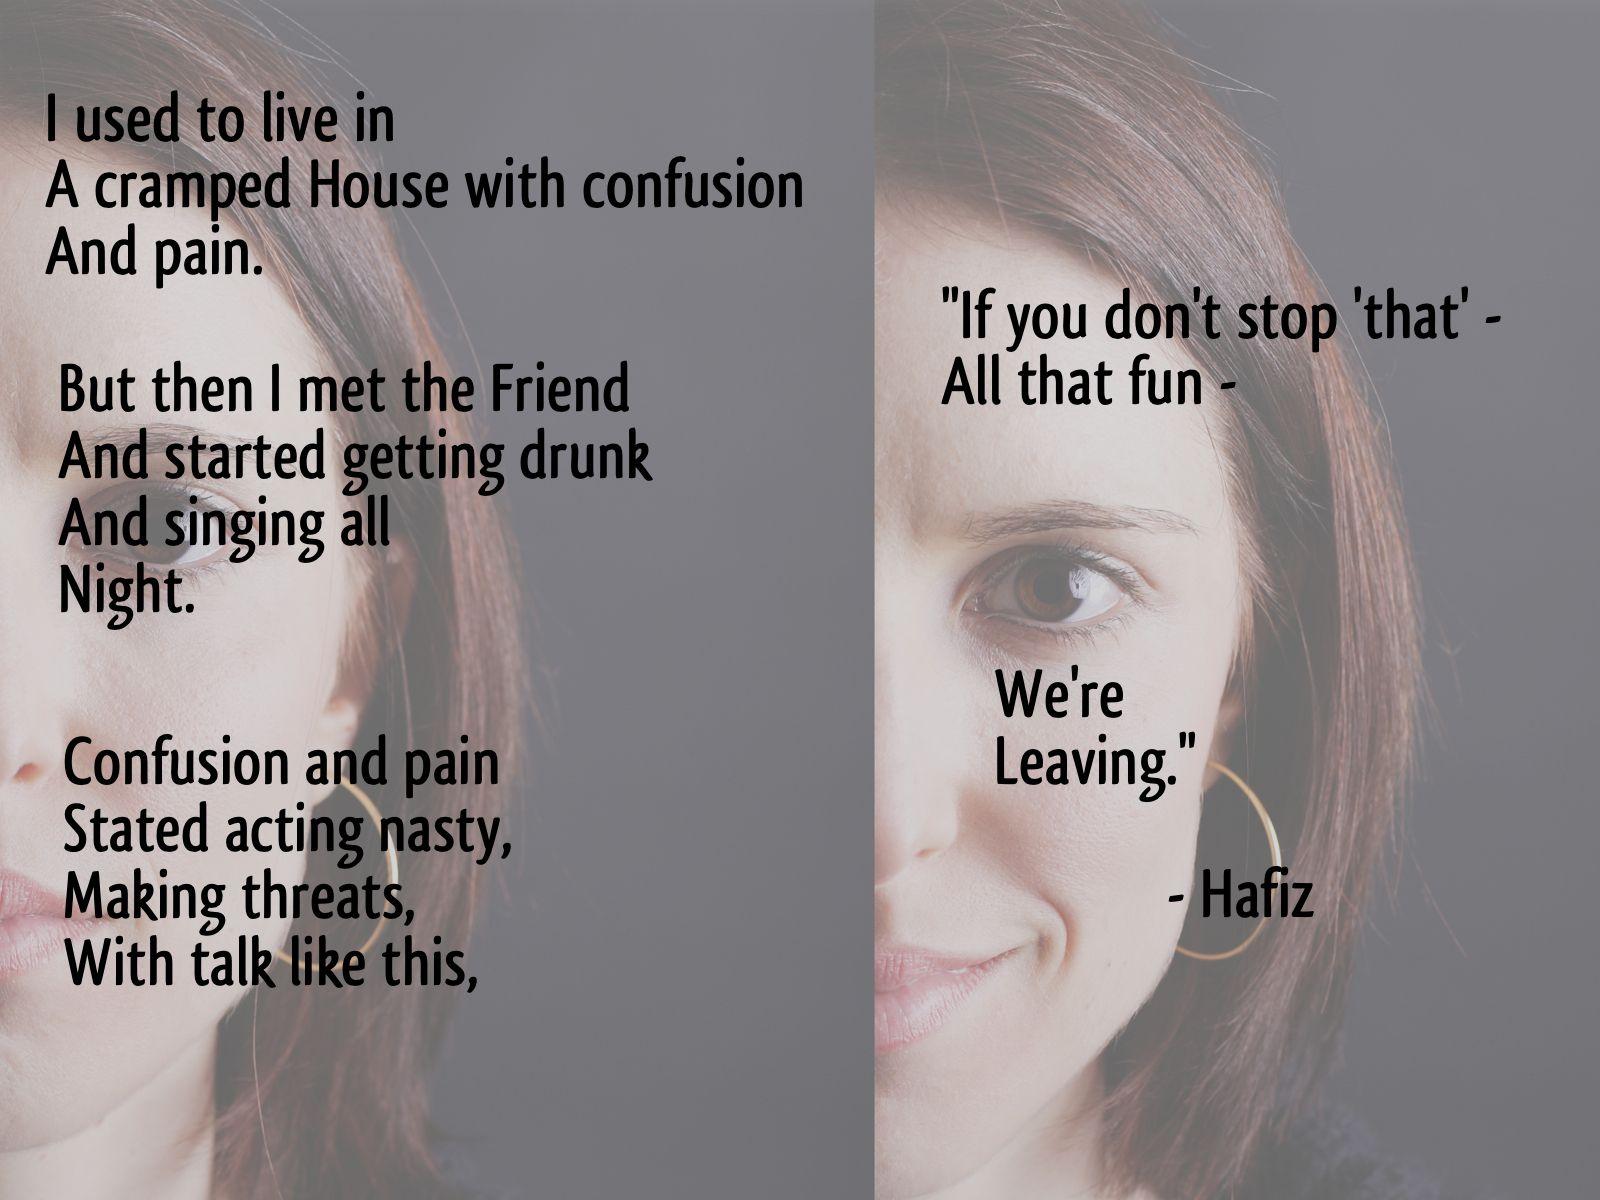 hafiz poems in english - photo #35